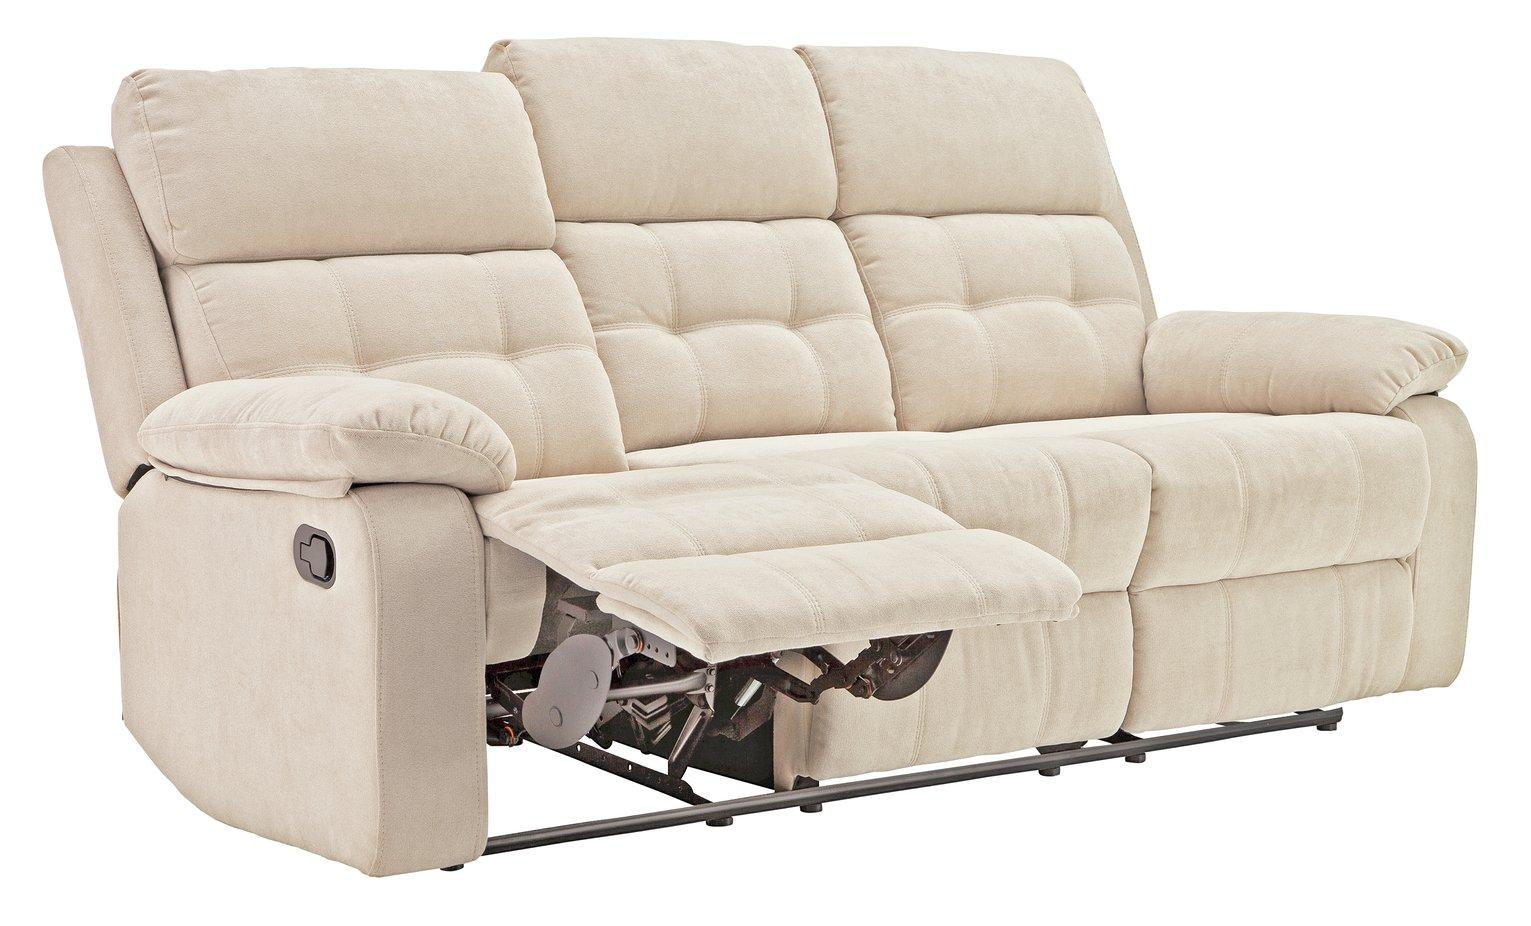 buy argos home june 3 seater fabric recliner sofa natural sofas rh argos co uk fabric reclining sofa with drop down table fabric reclining sofa and loveseat set